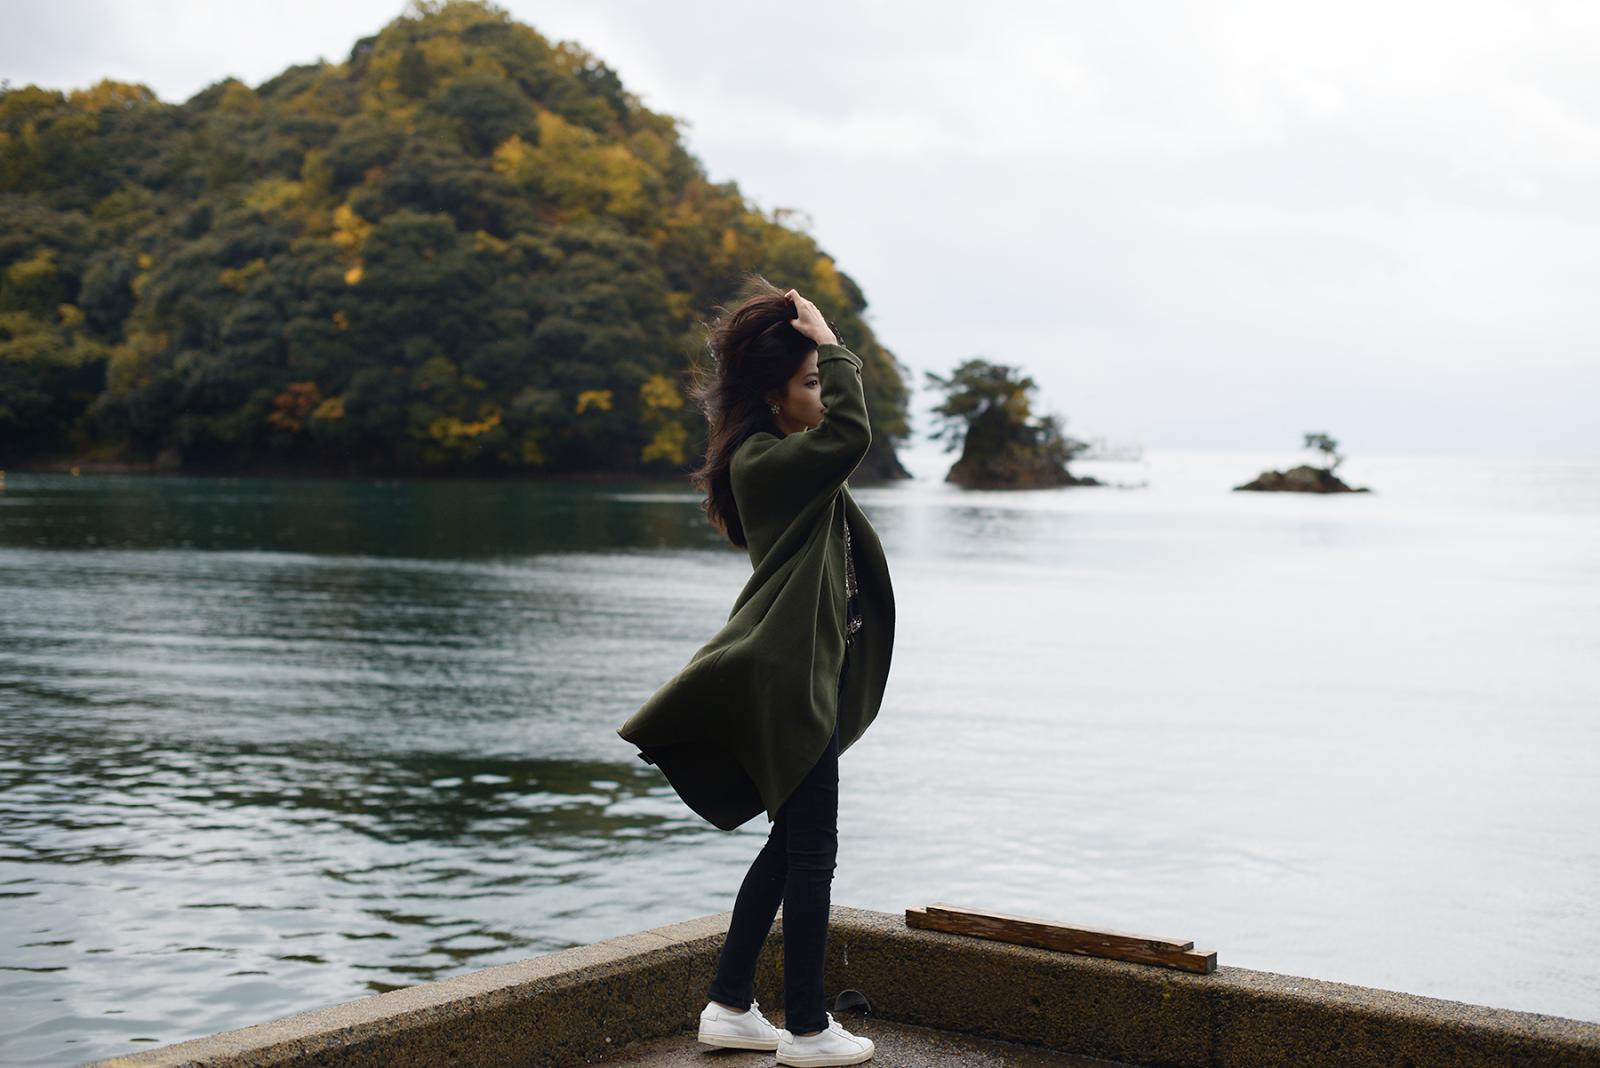 Ine-no Funaya, Japan's Venice / FOREVERVANNY.com